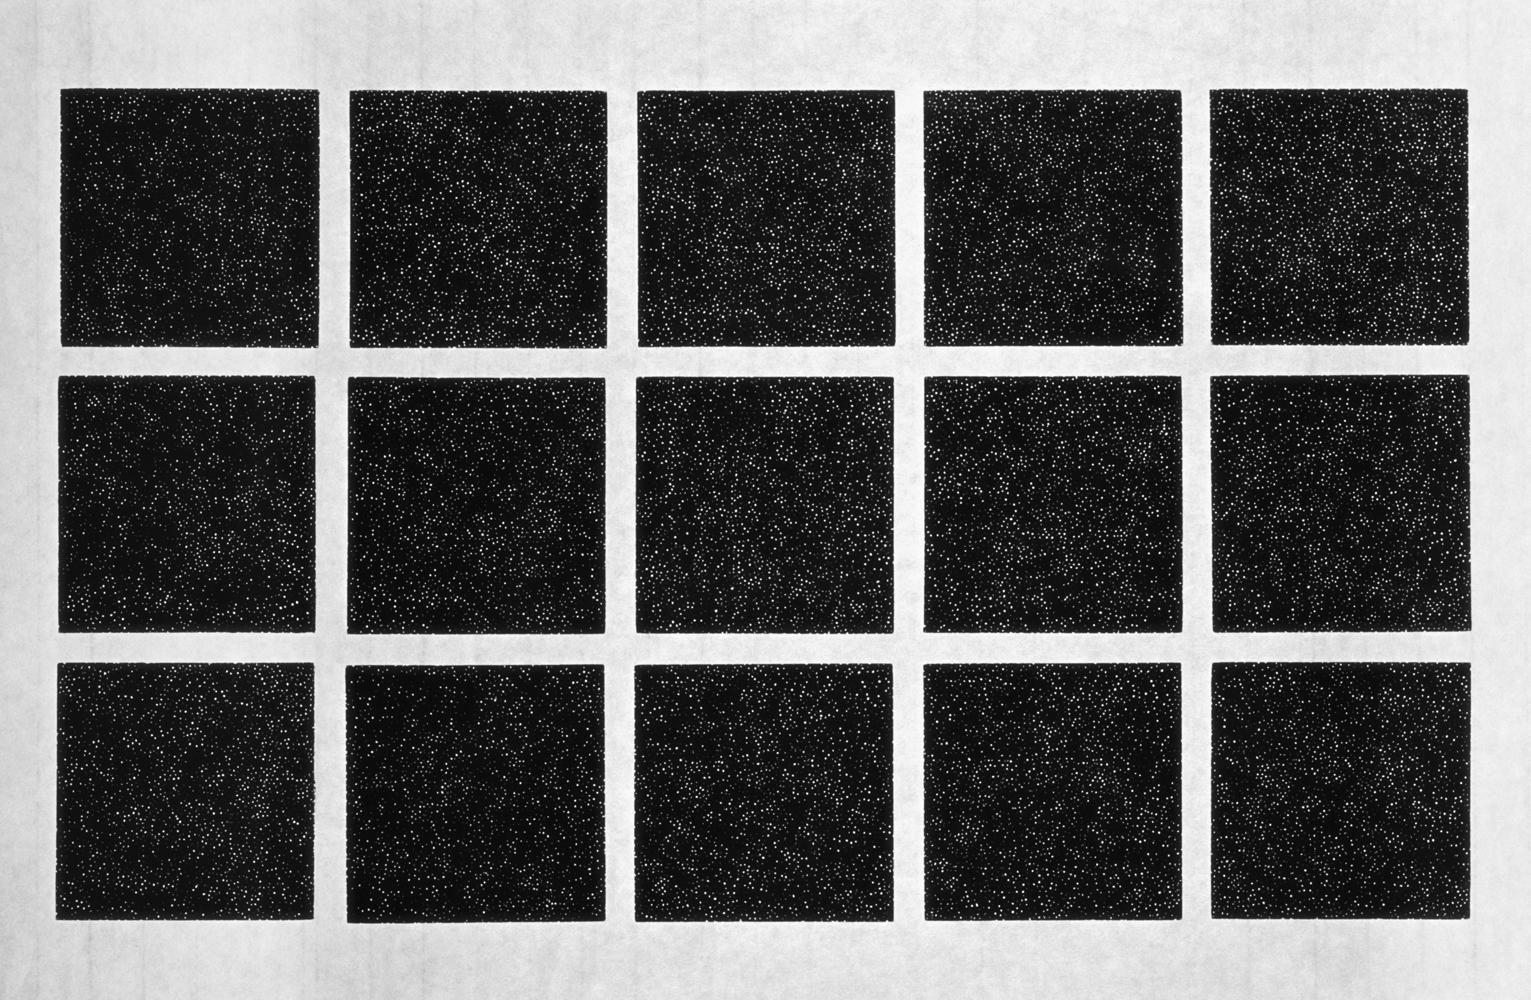 Linda Davidson, Stars, 2005, woodblock, 18 x 32 inches, framed, $1600.